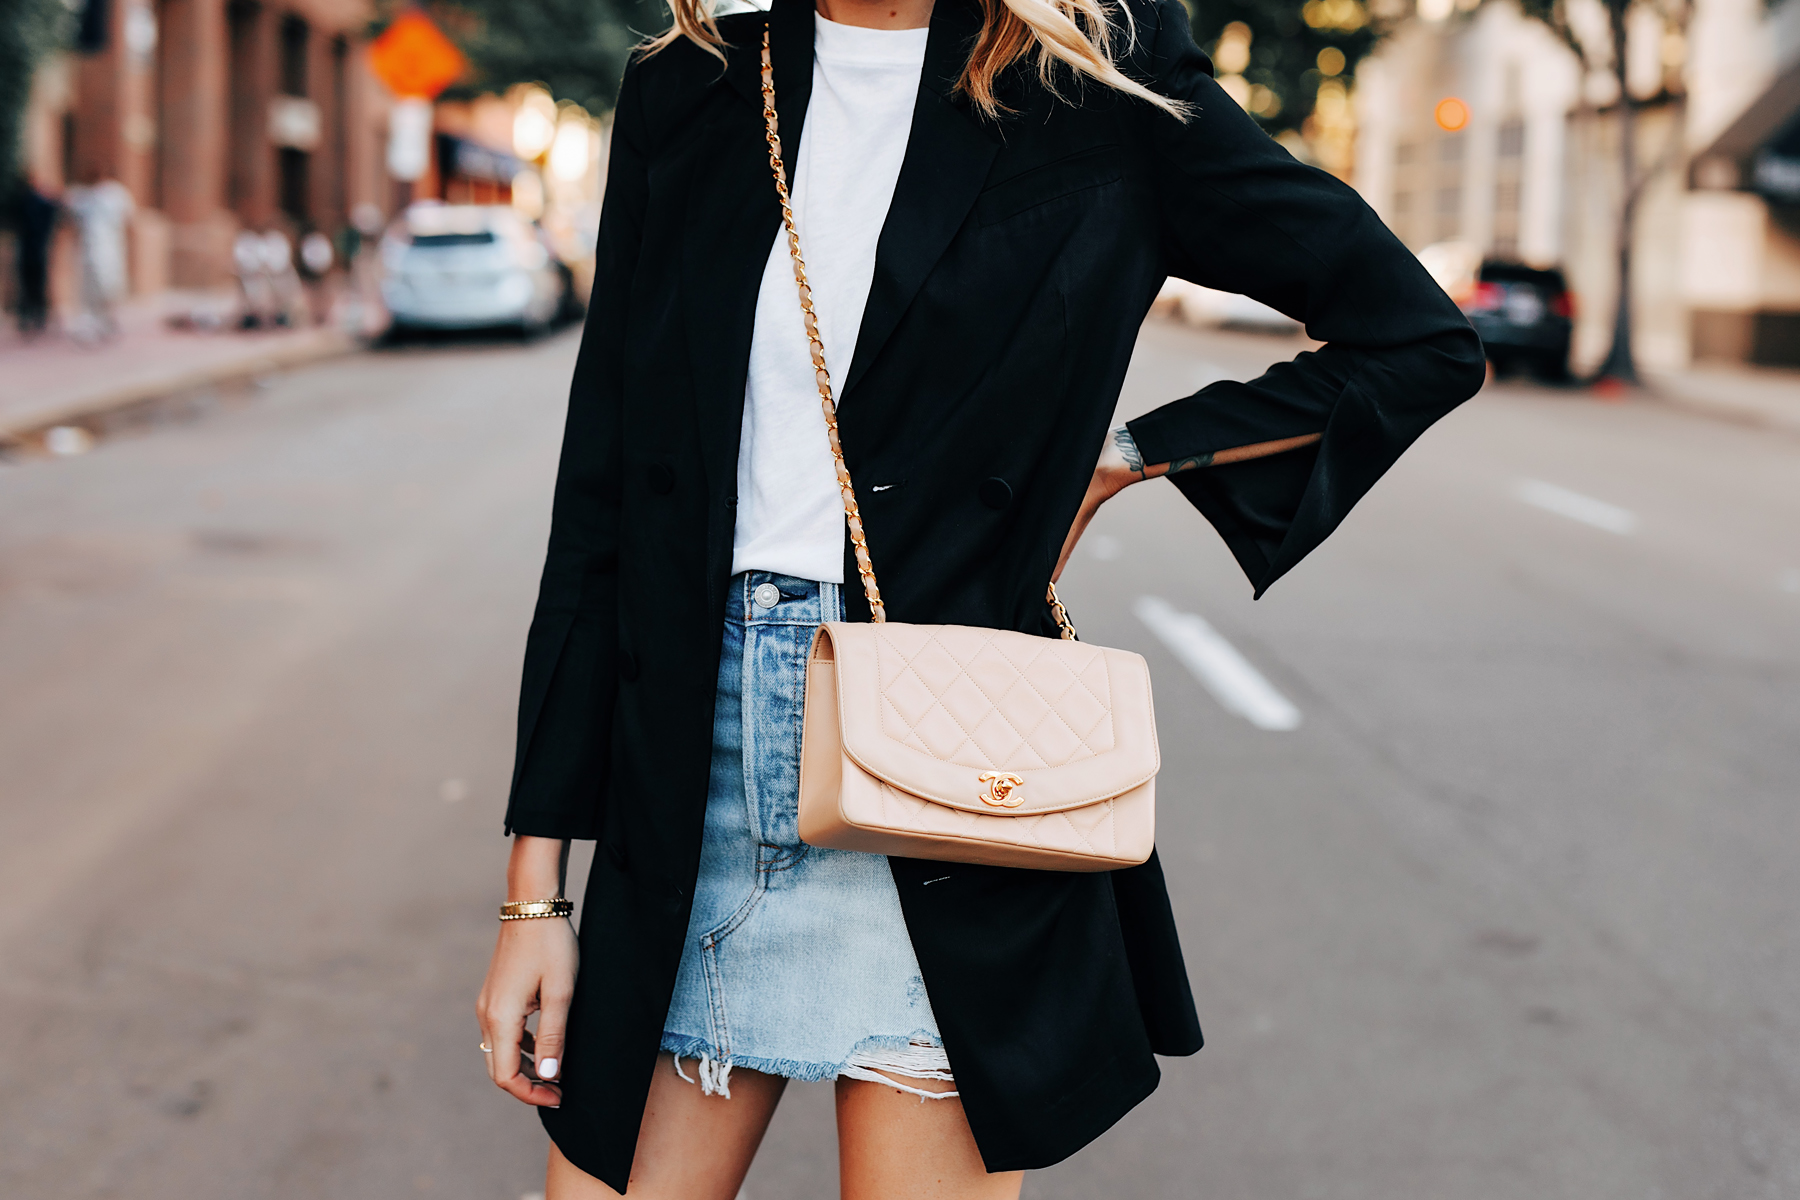 Fashion Jackson Wearing Anine Bing Black Blazer White Tshirt Levis Denim Skirt Chanel Beige Handbag 1